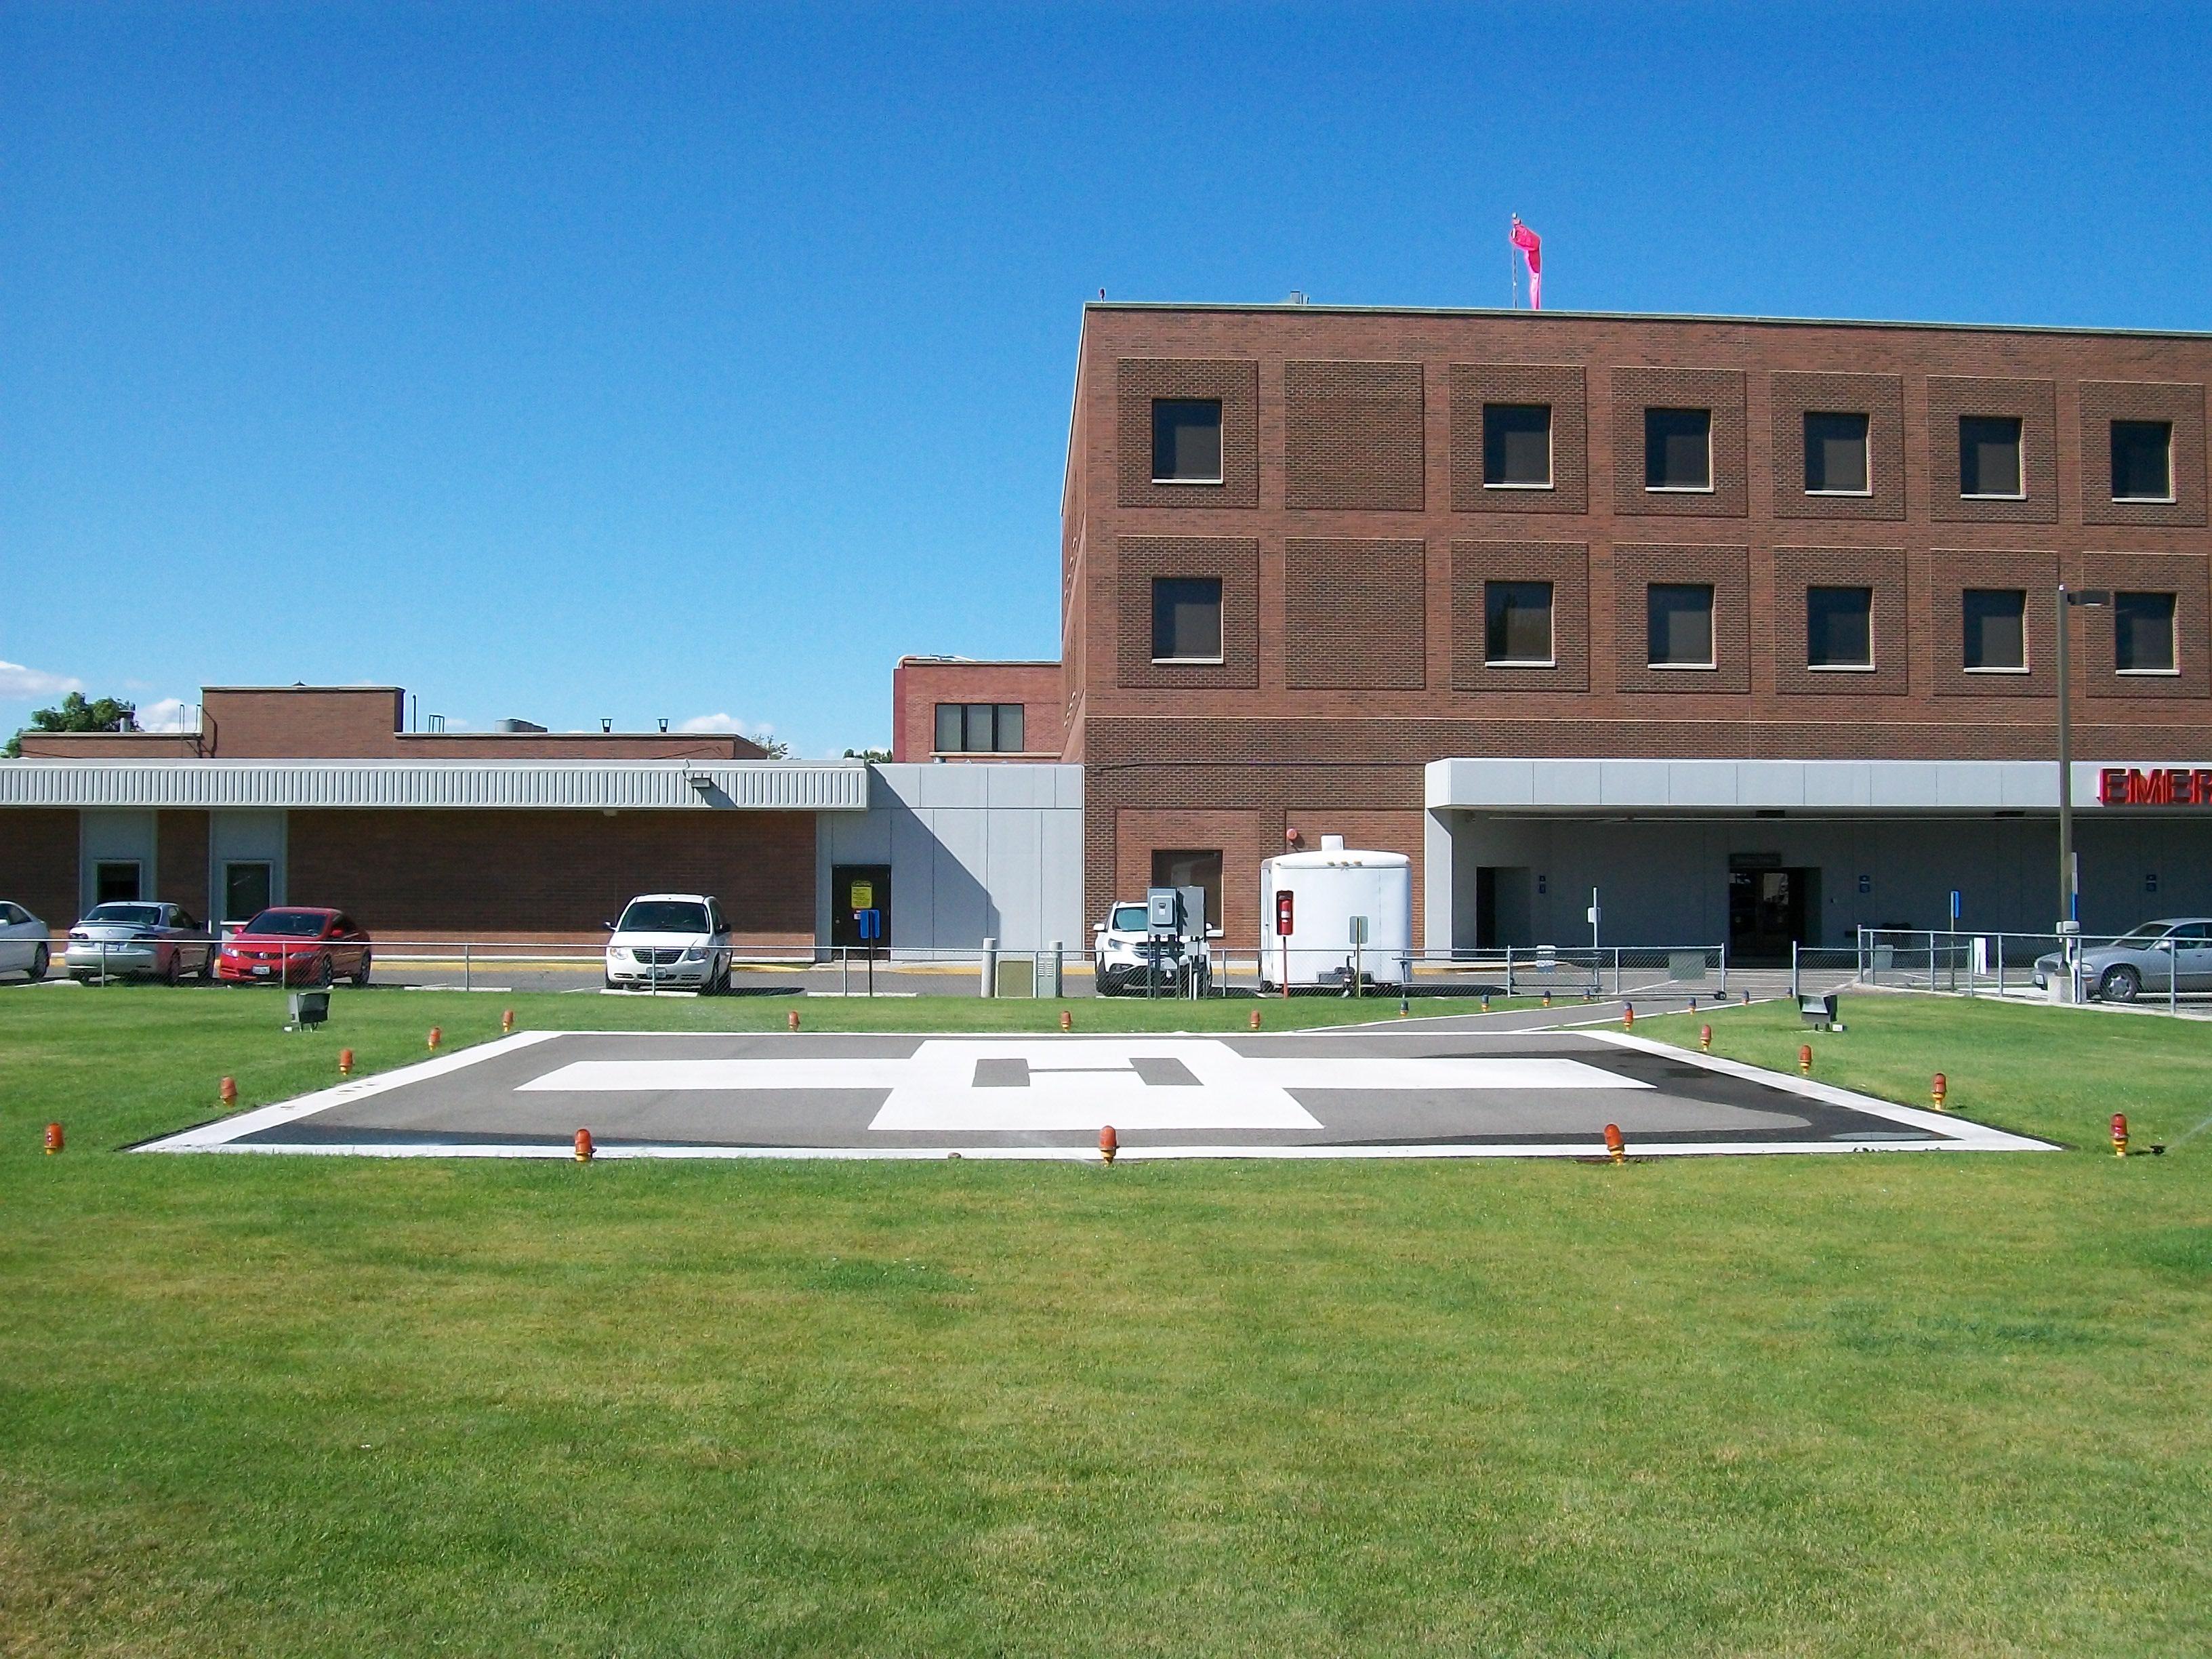 File:Lourdes Hospital helipad in Pasco, Washington 2.jpg